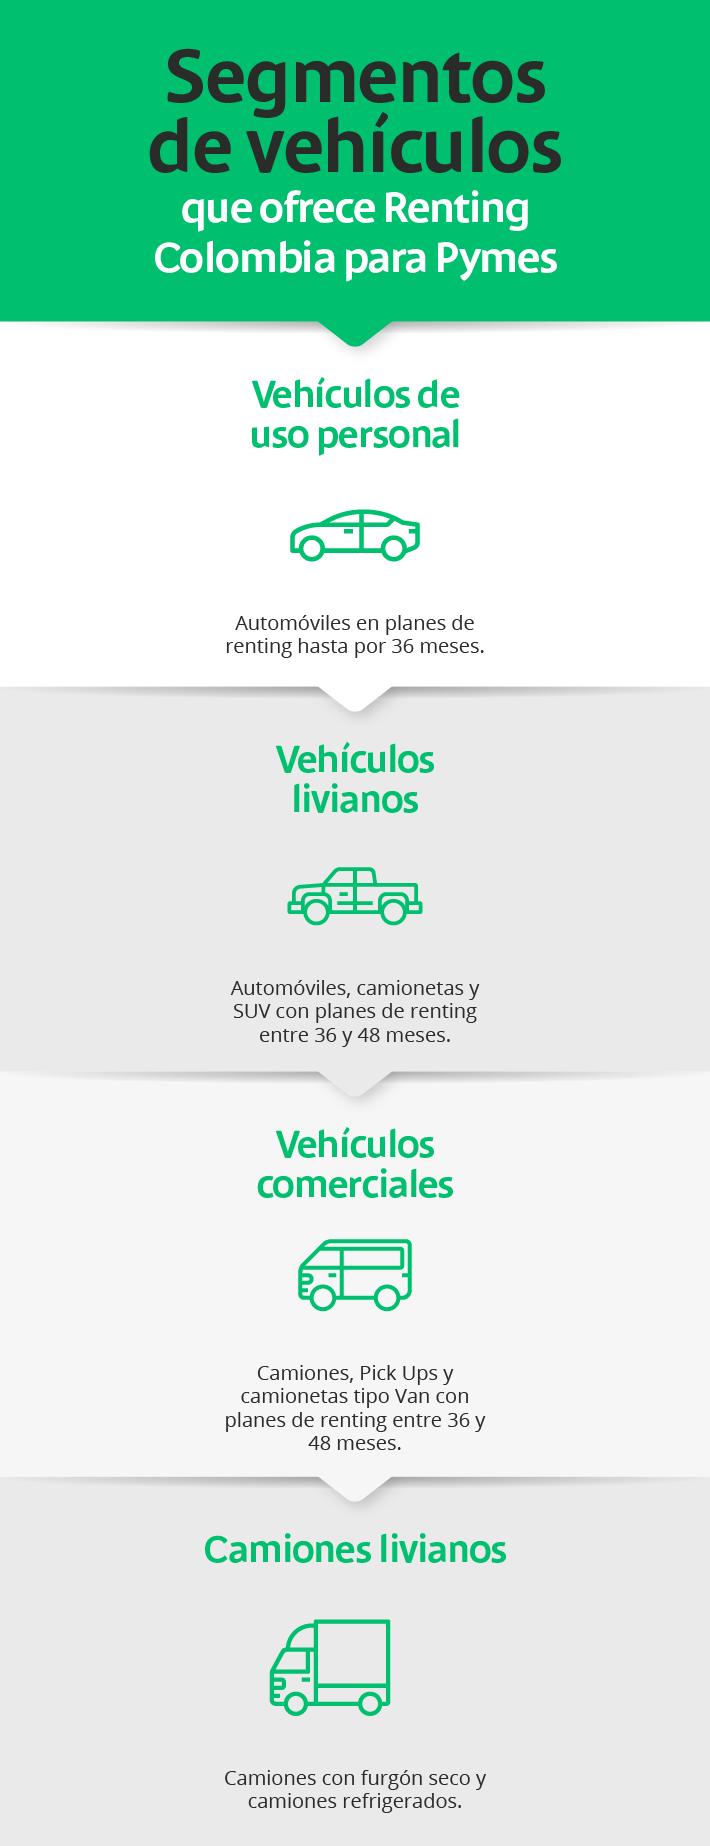 renting corporativo - segmentos de vehiculos blog-01